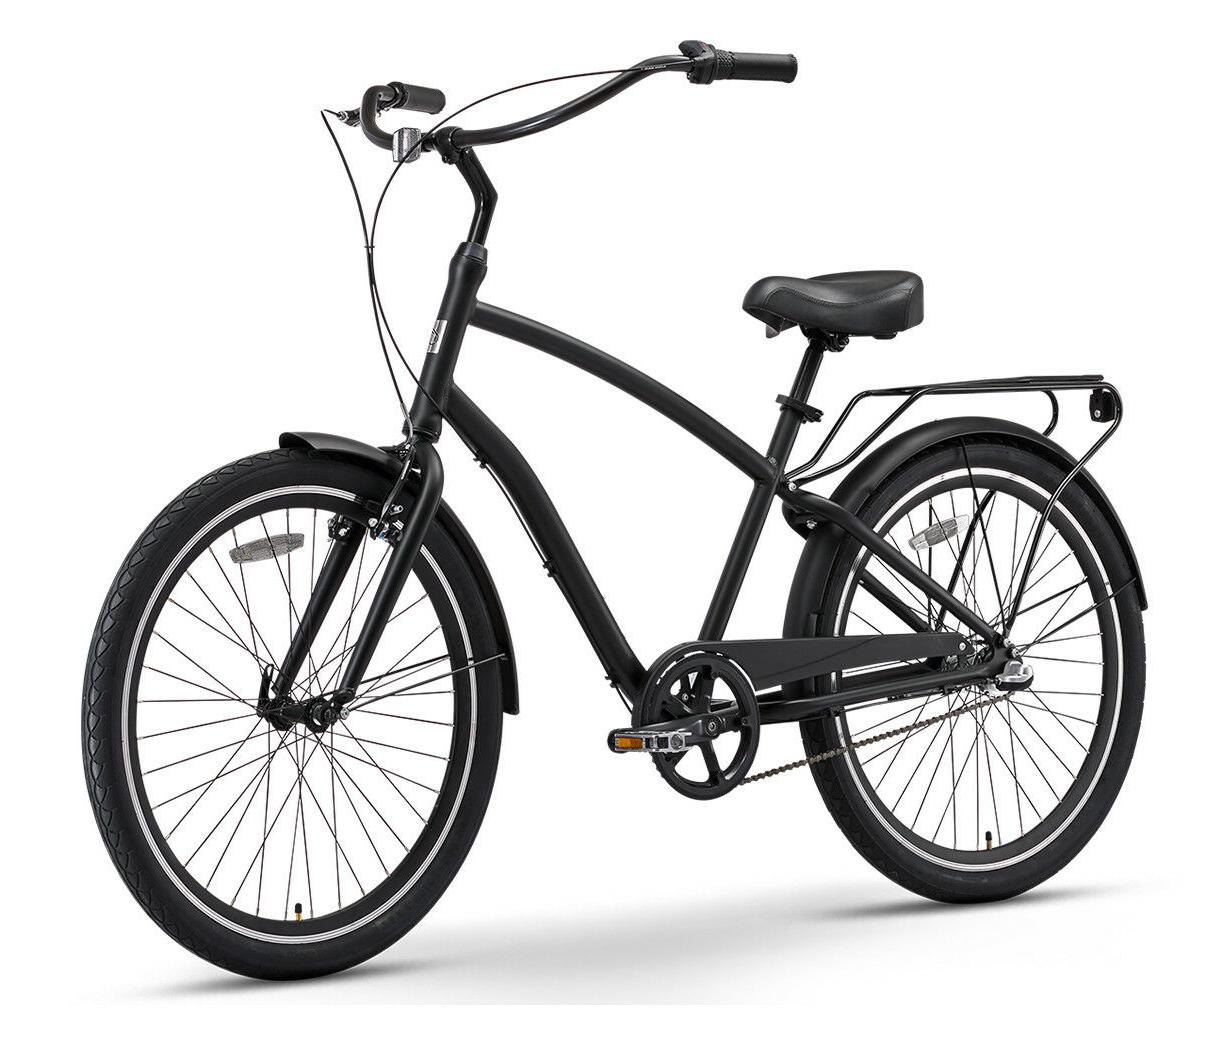 sixthreezero EVRYjourney 3 Speed Hybrid Touring Cruiser Bike